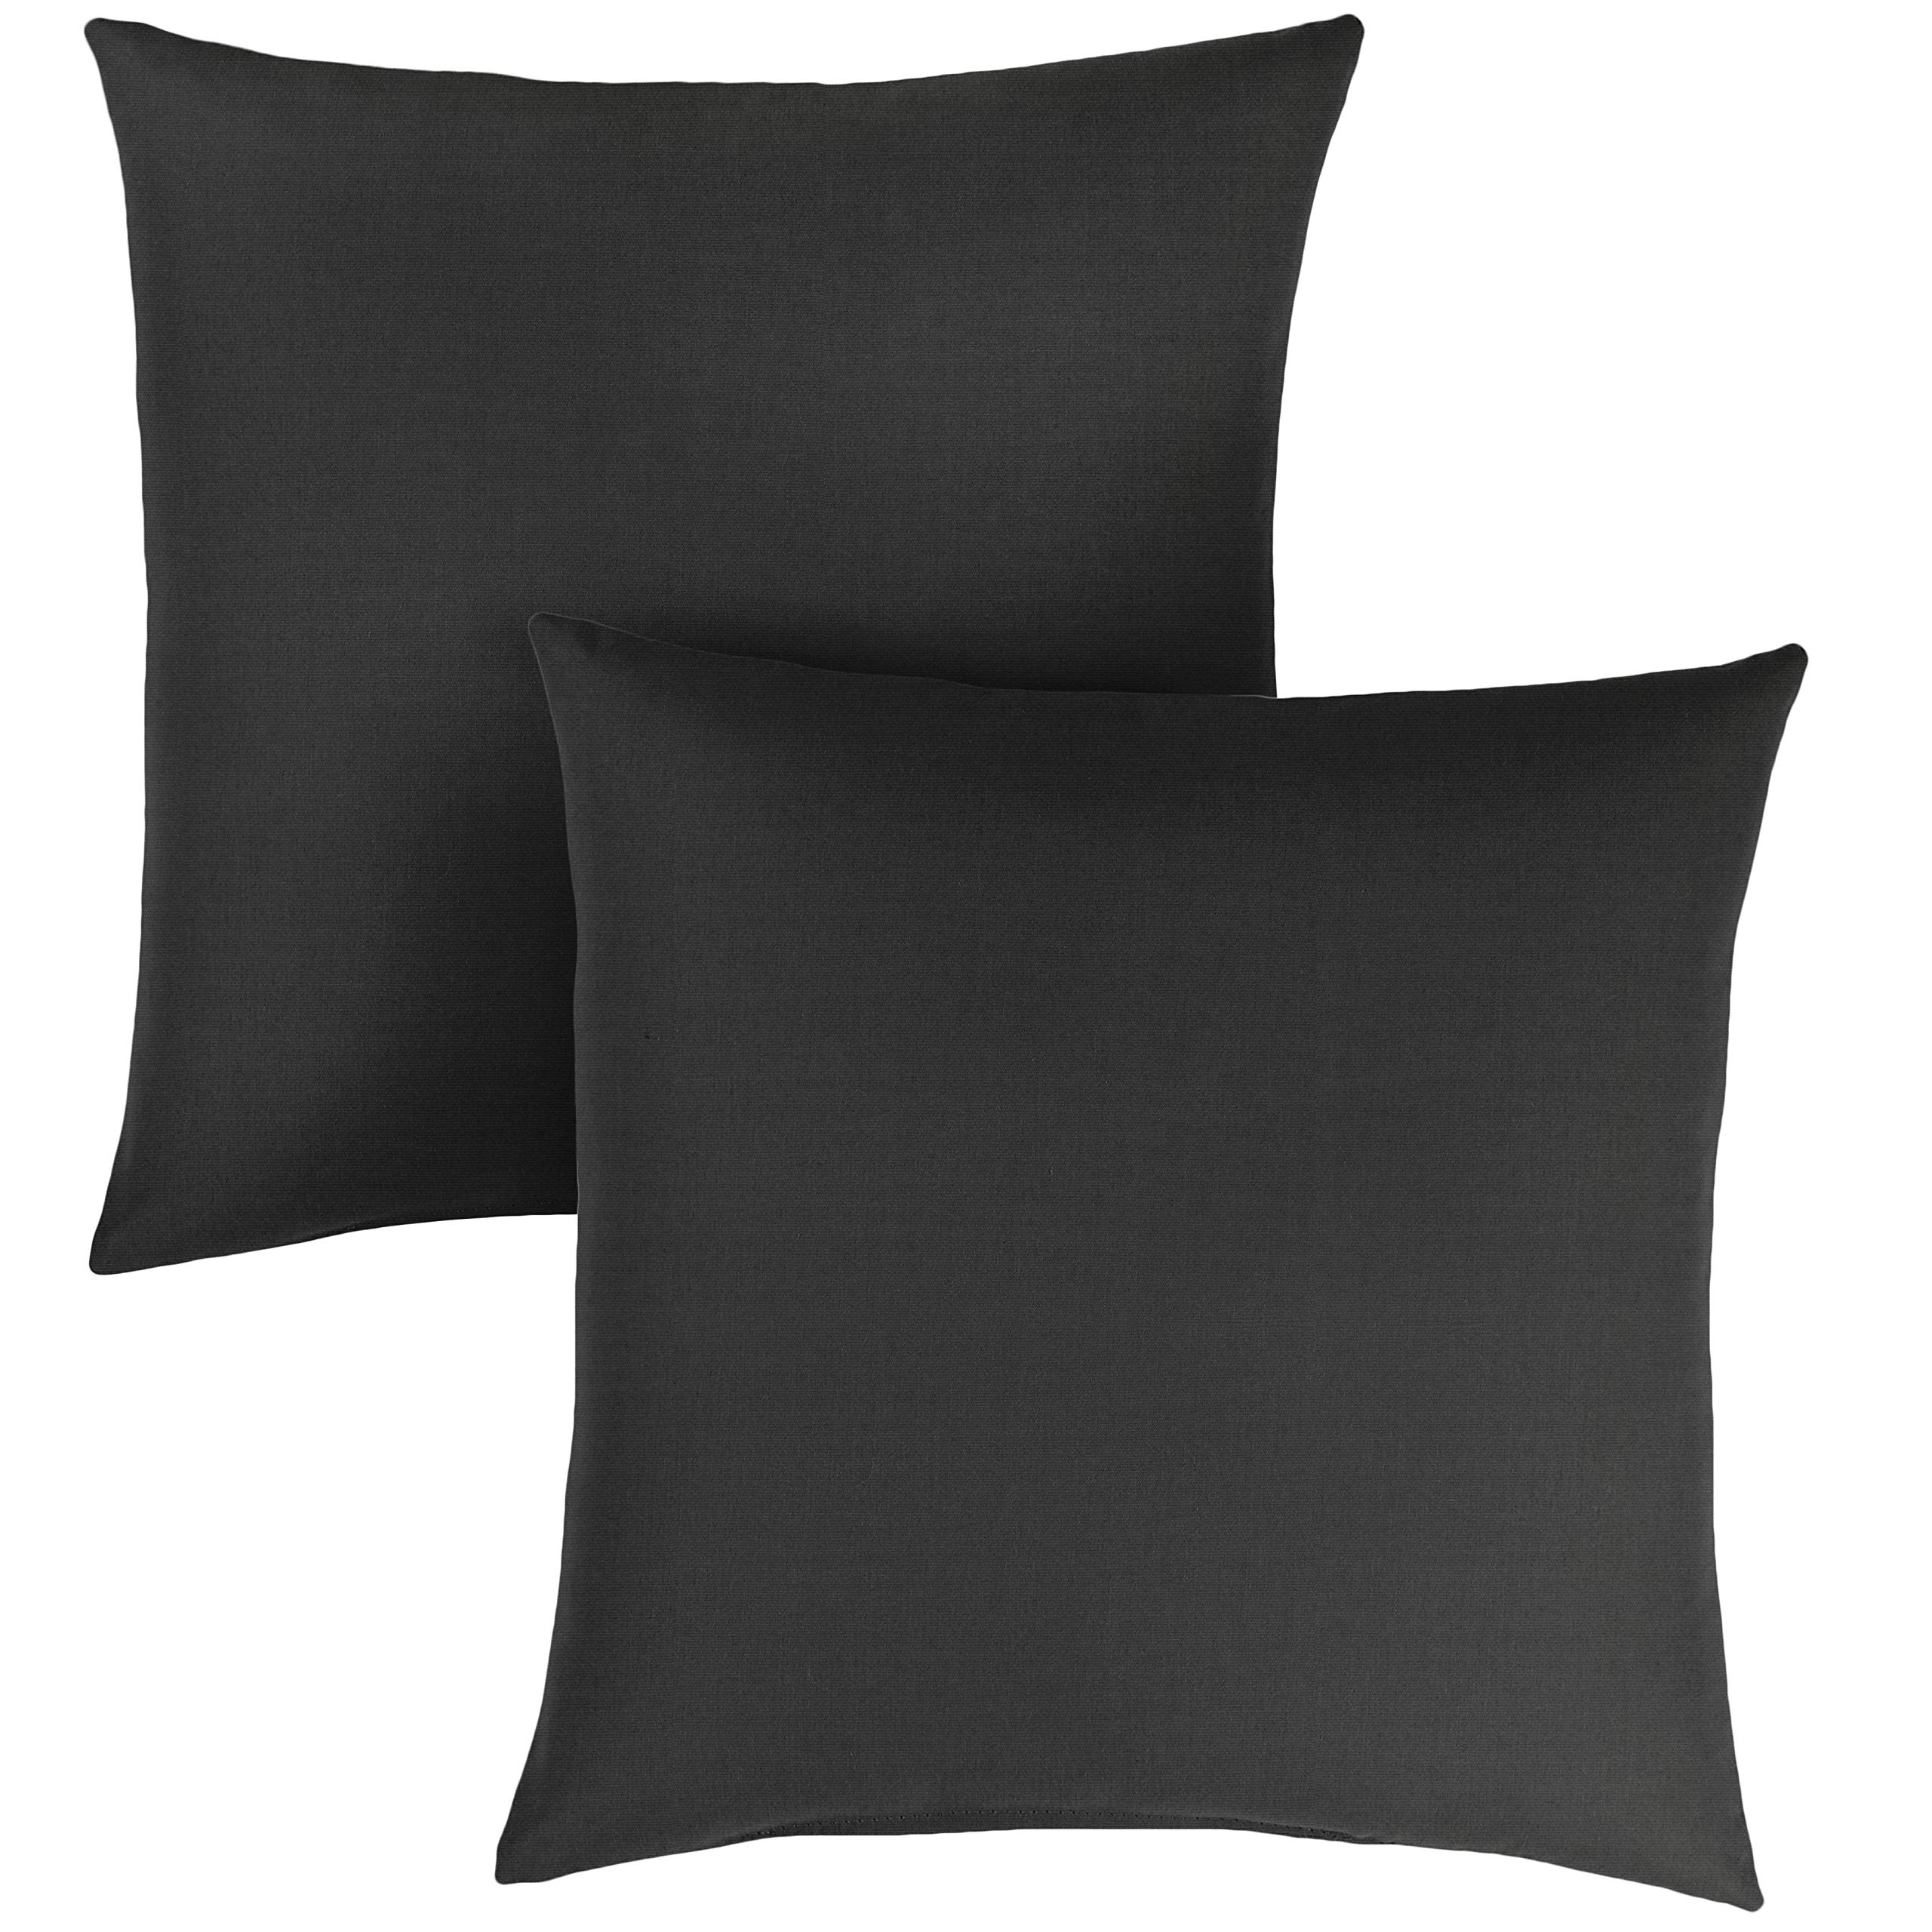 1101Design Sunbrella Canvas Black Knife Edge Decorative Indoor/Outdoor Square Throw Pillows, Perfect for Patio Décor, (Canvas Black 20'') - Set of 2